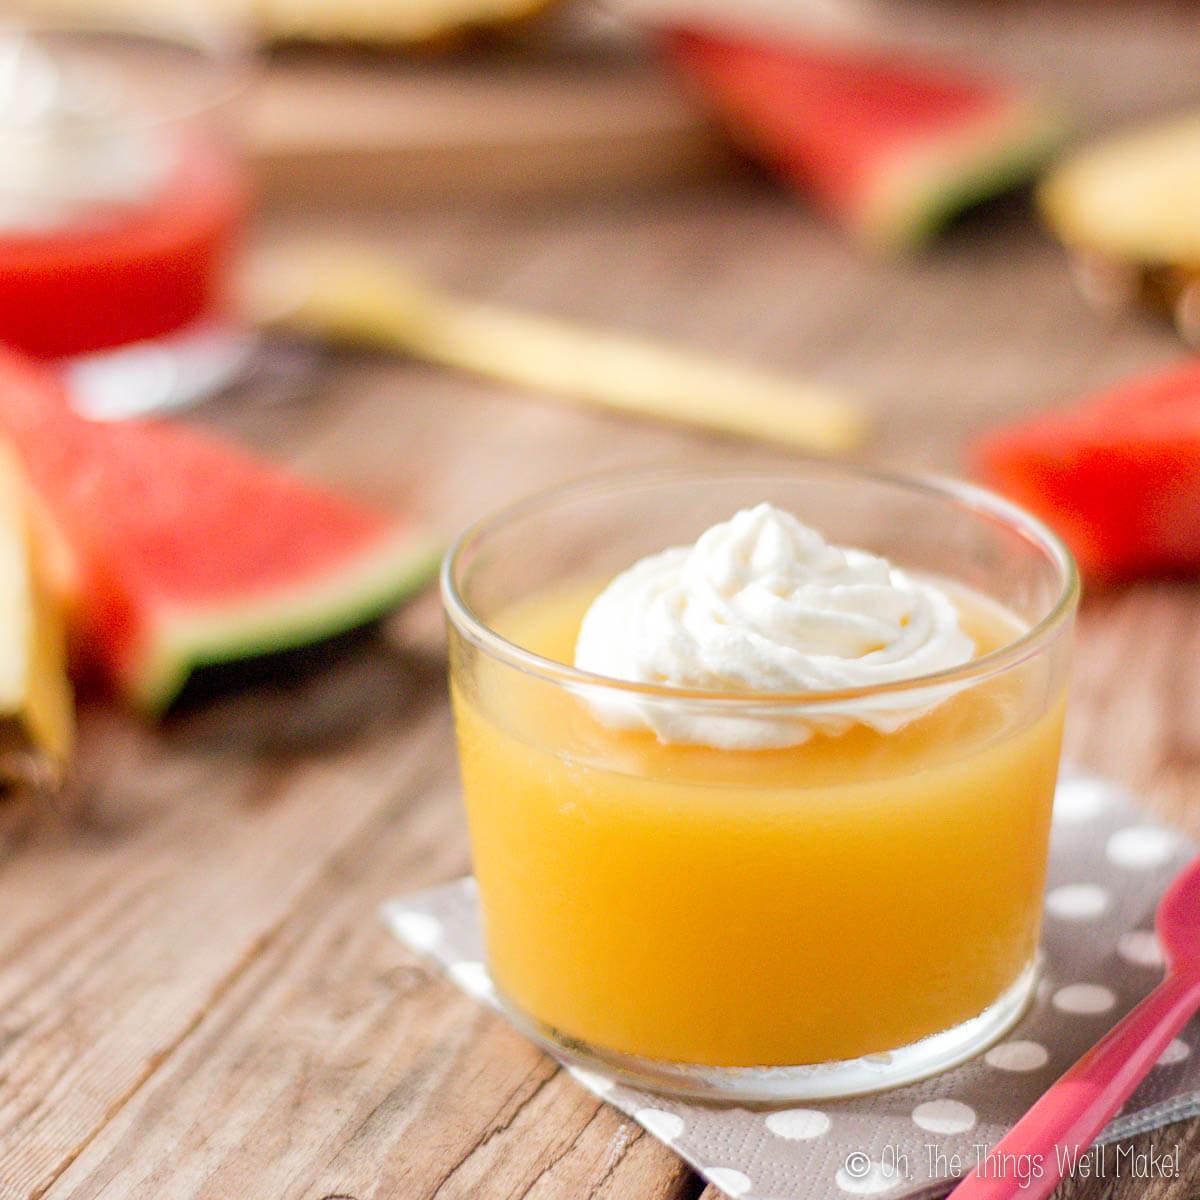 Closeup of homemade pineapple gelatin in front of homemade watermelon gelatin.